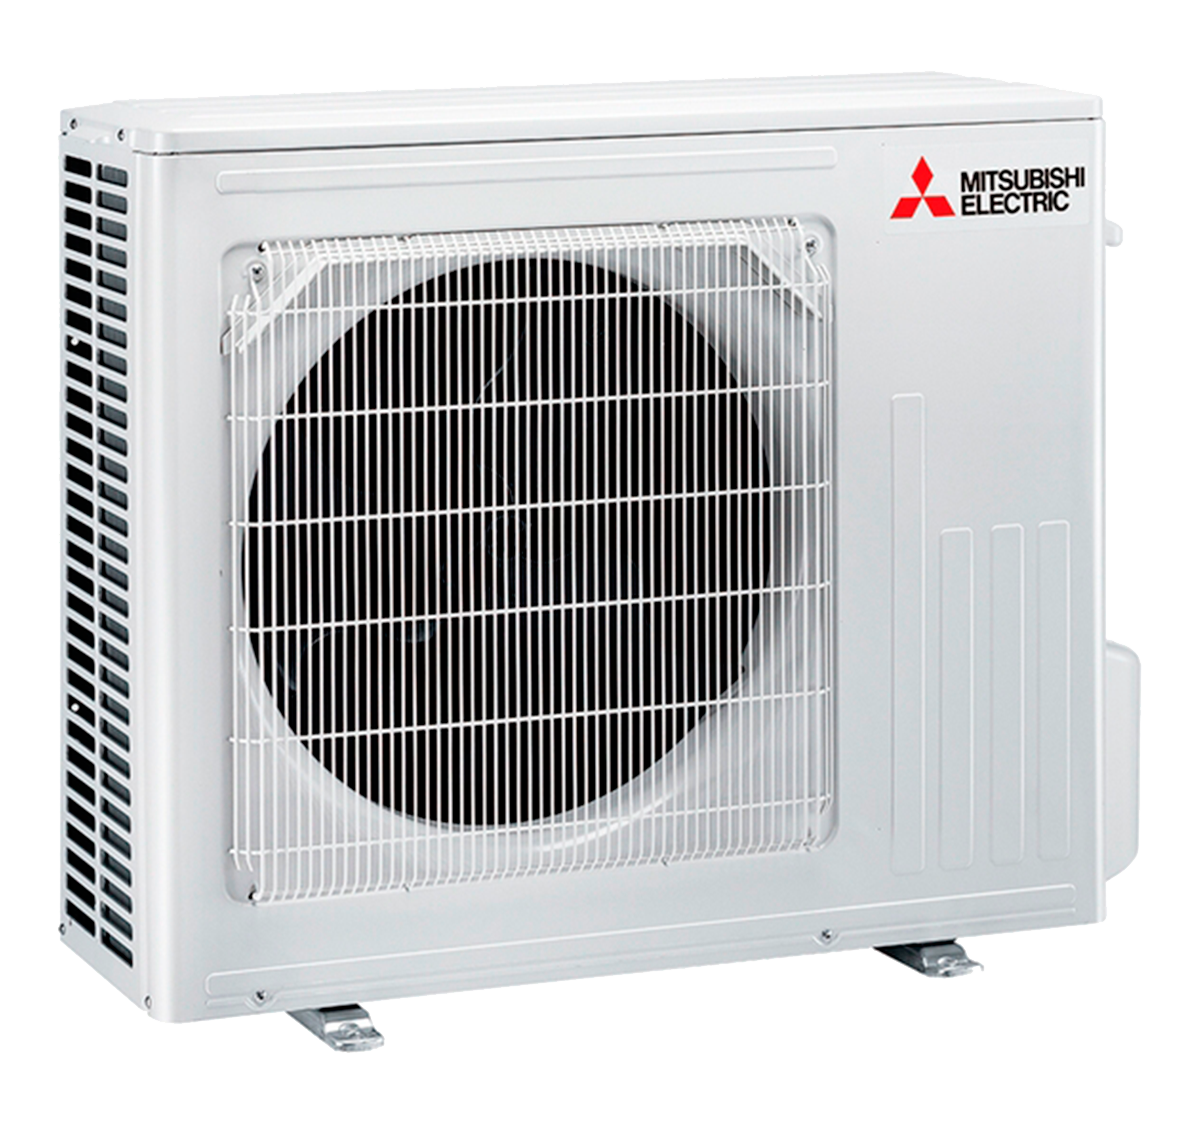 aire acondicionado unidad exterior mitsubishi electric inverter muz ln50vg serie kirigamine style modelo msz ln50vgb precio incluido instalacion caseragua 01